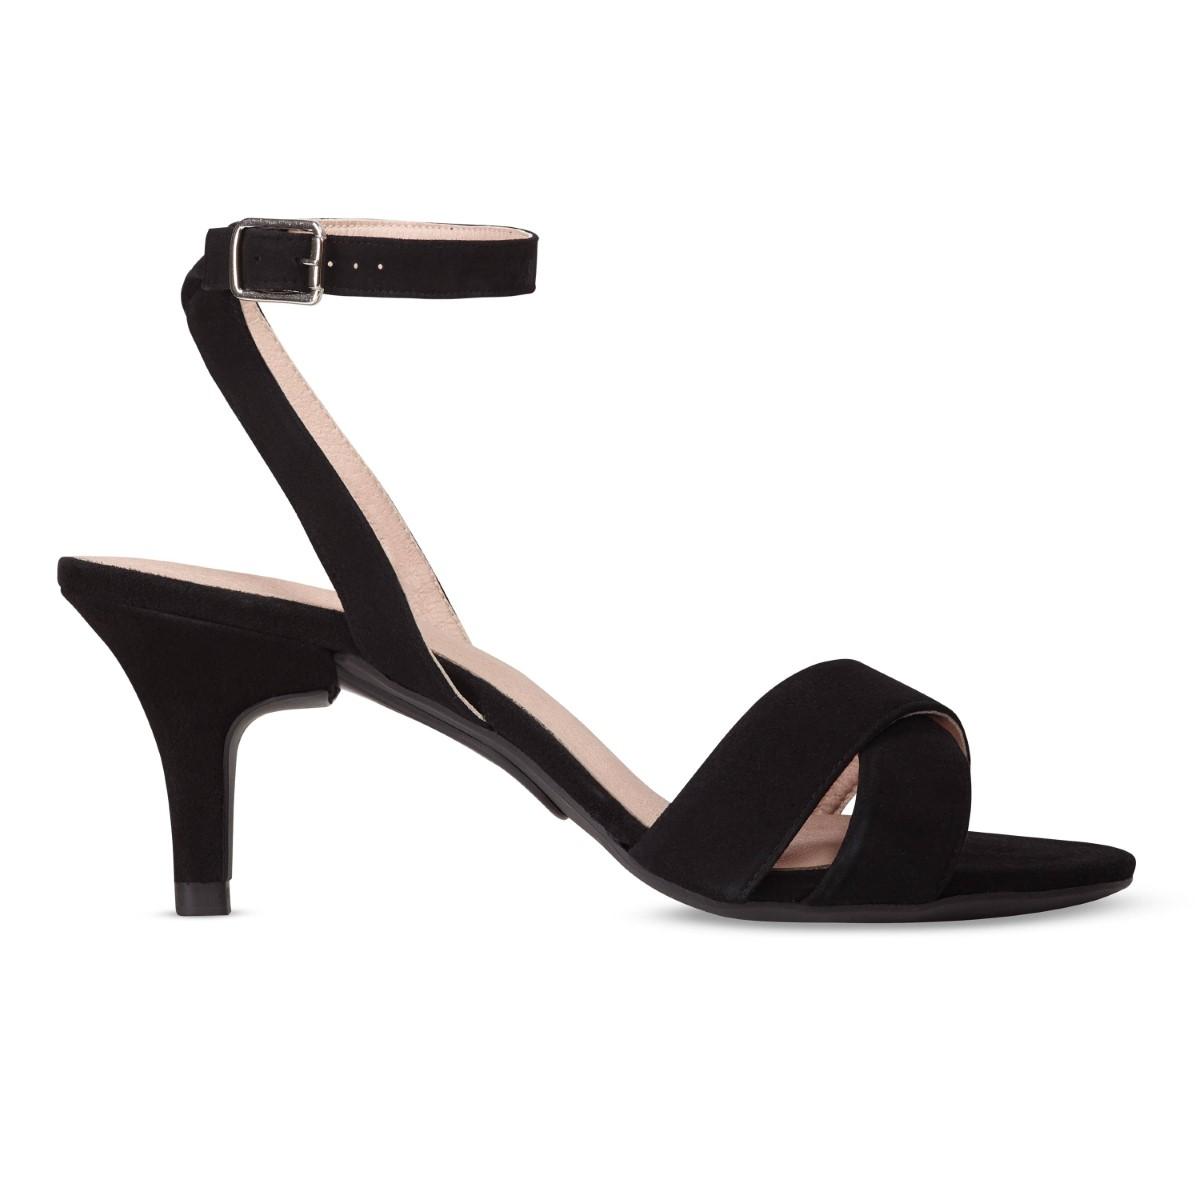 N°4 Black Suede / Stiletto 7cm